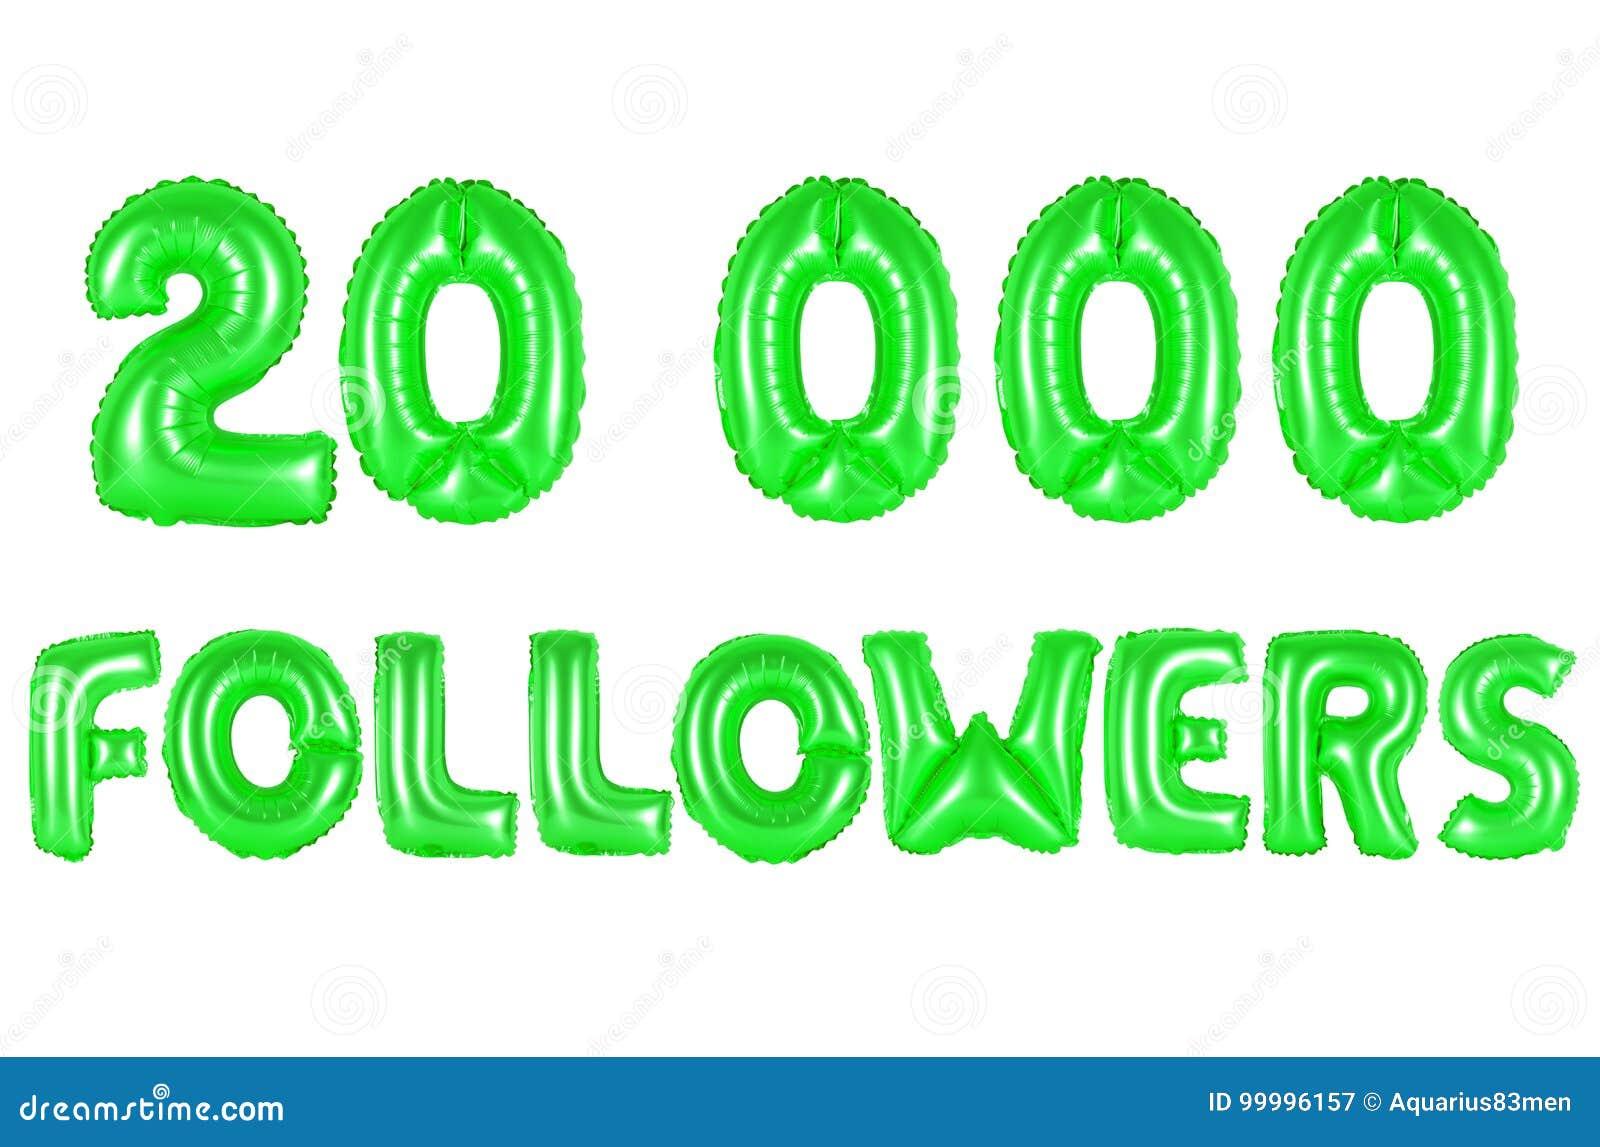 Twenty Thousand Followers, Green Color Stock Image - Image of like ...